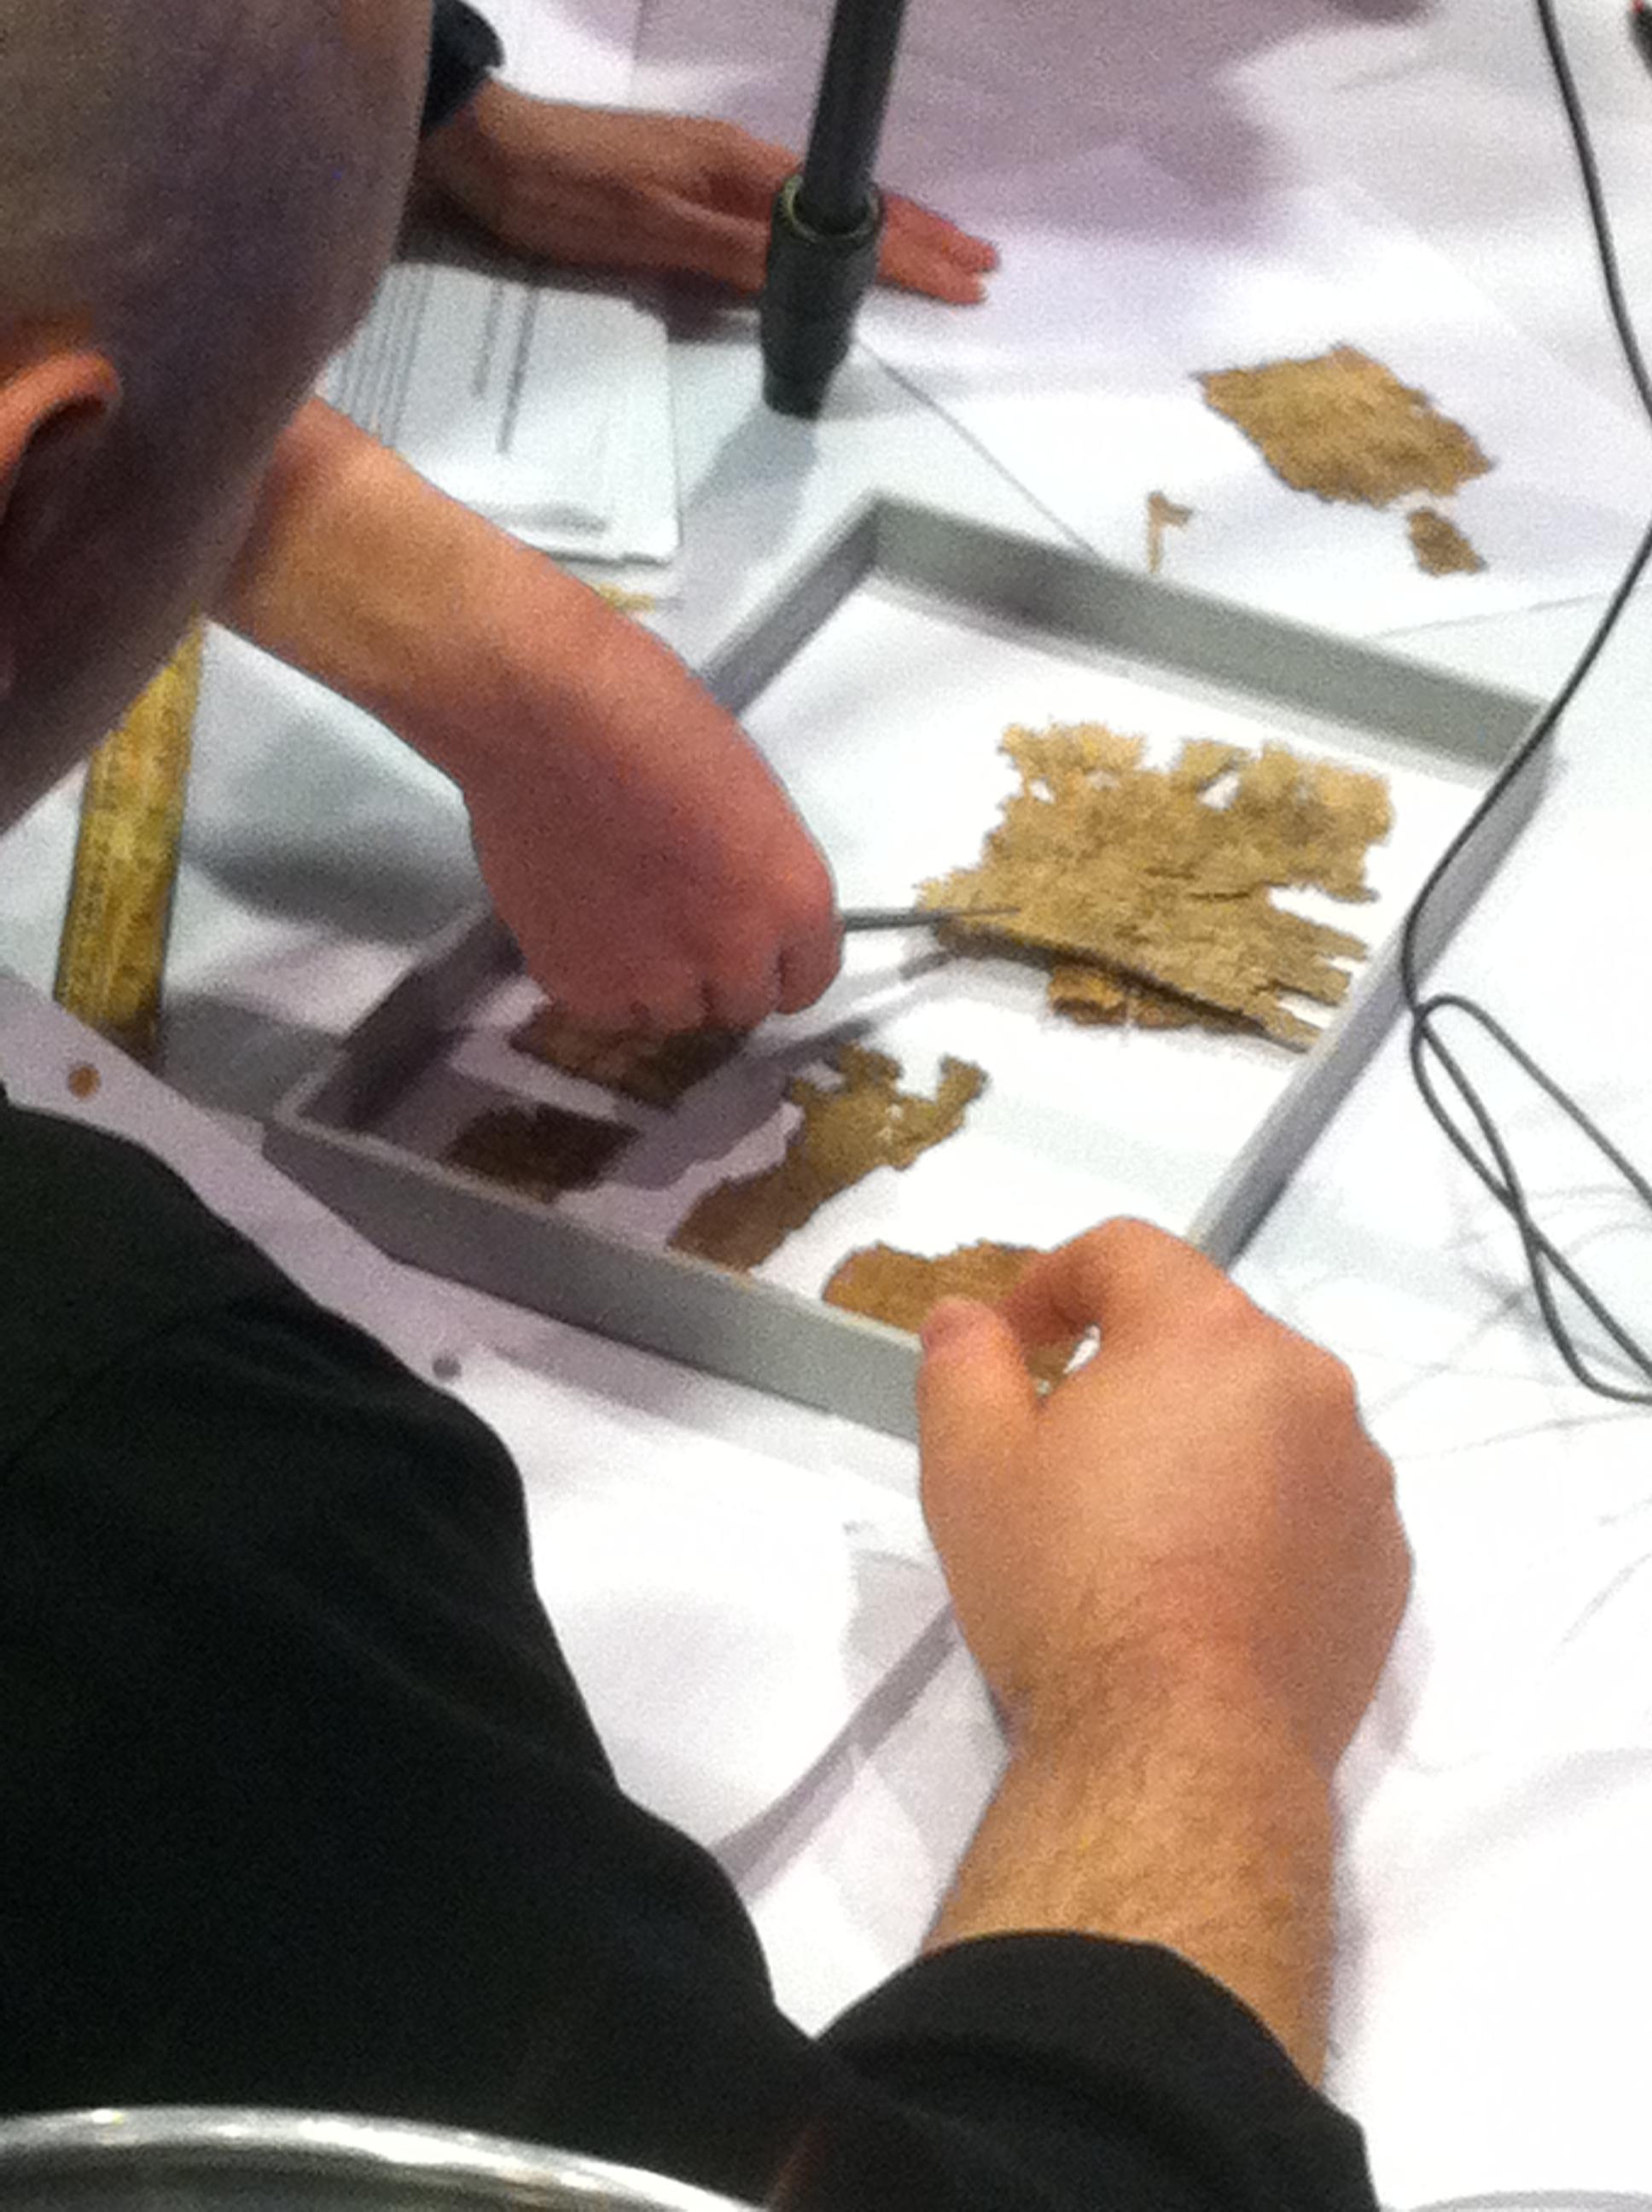 Assisting with ancient manuscript fragments